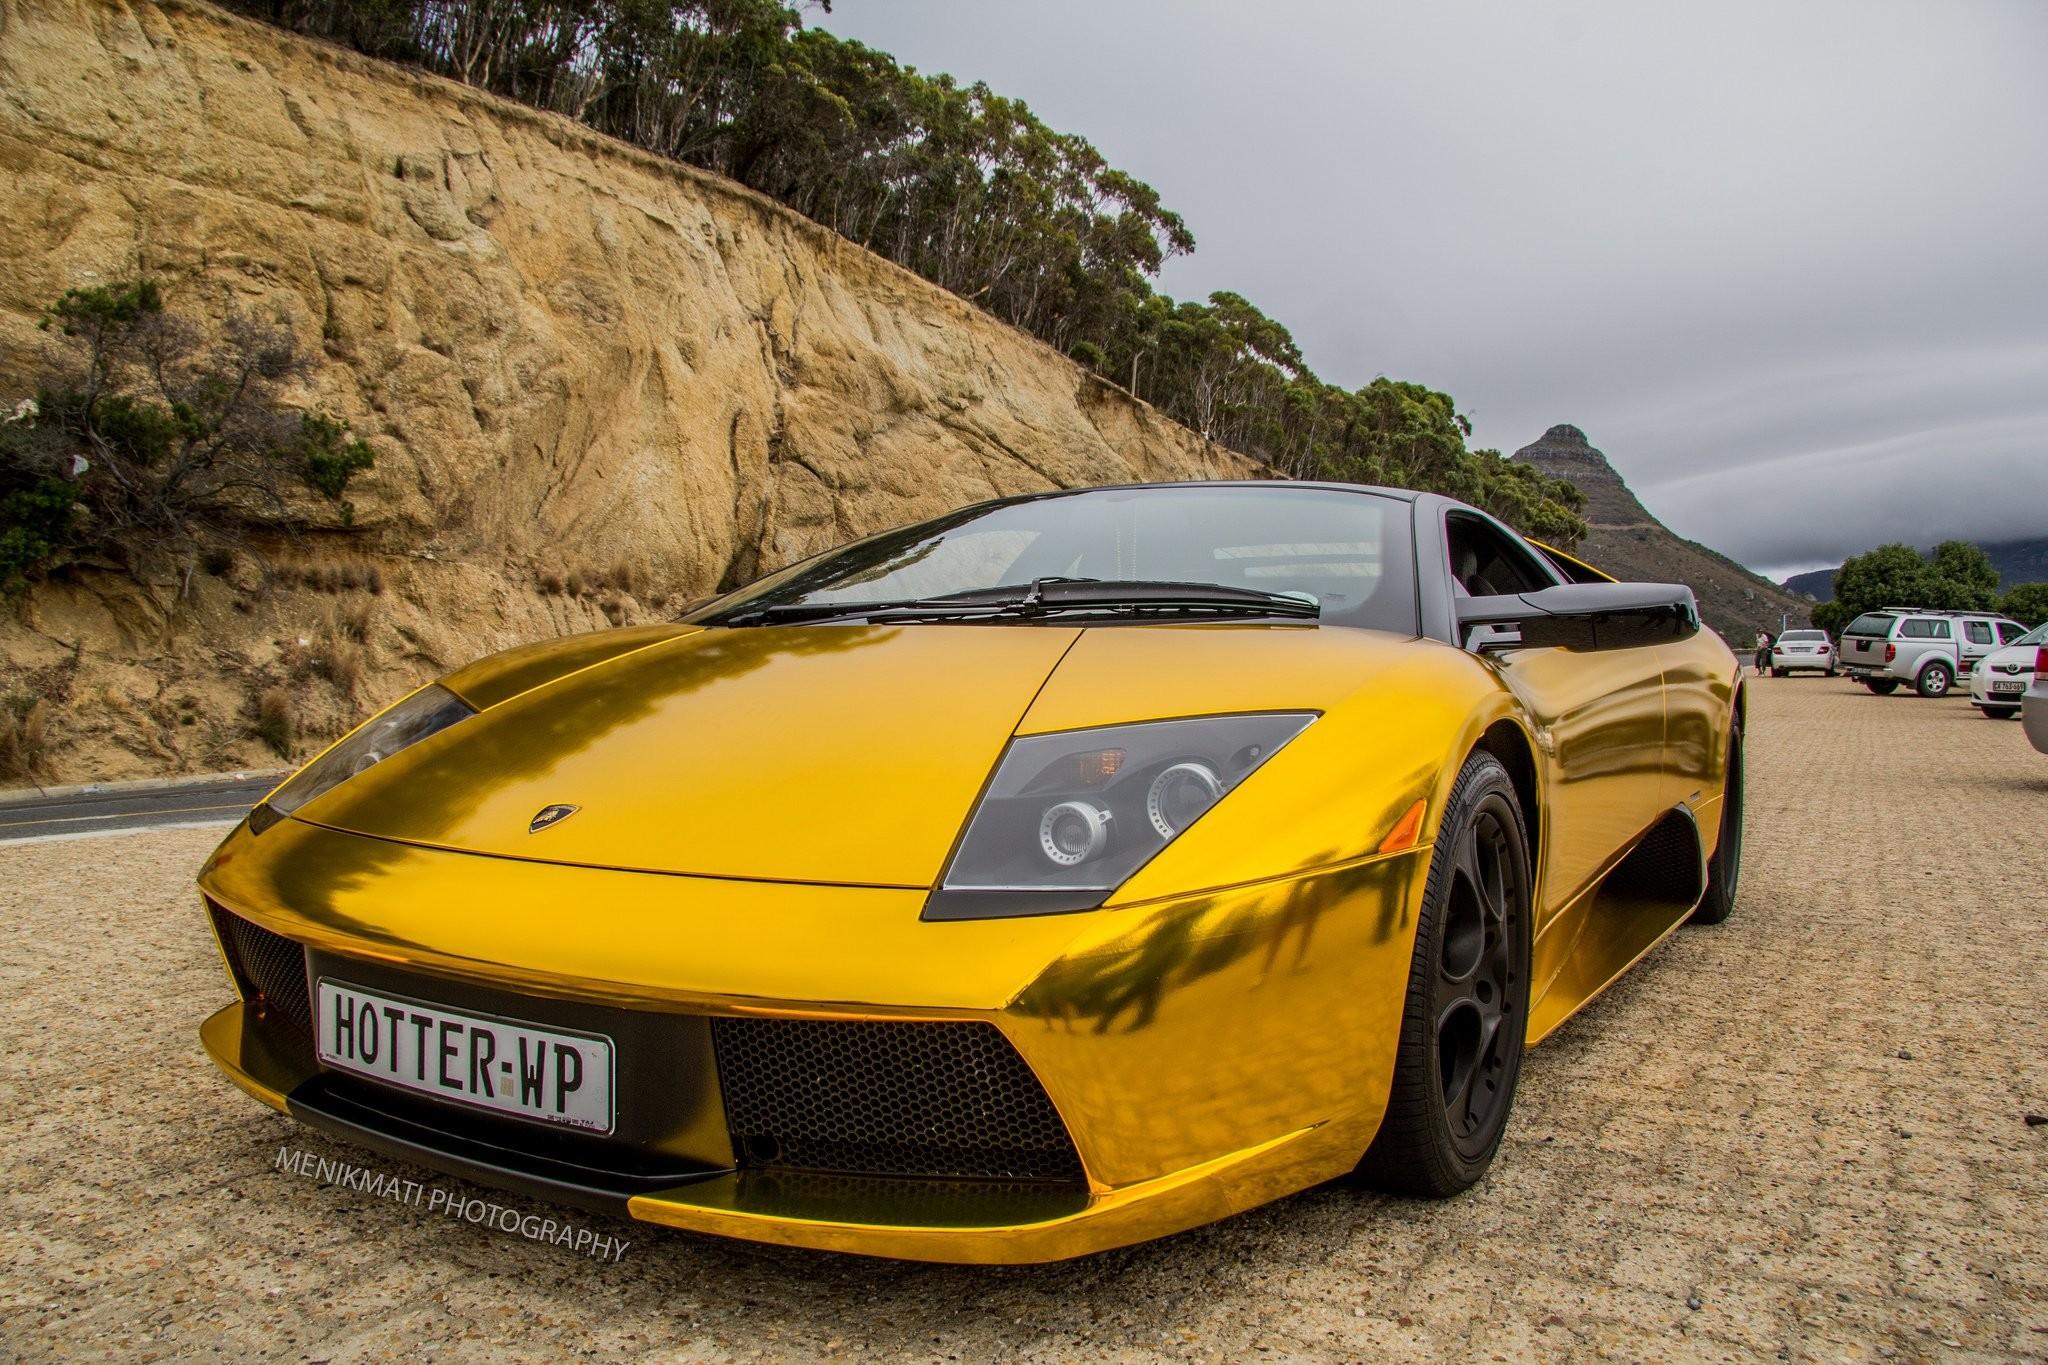 Lamborghini Murcielago gold chrome coupe Vinyl wrap cars supercars wallpaper      609400   WallpaperUP